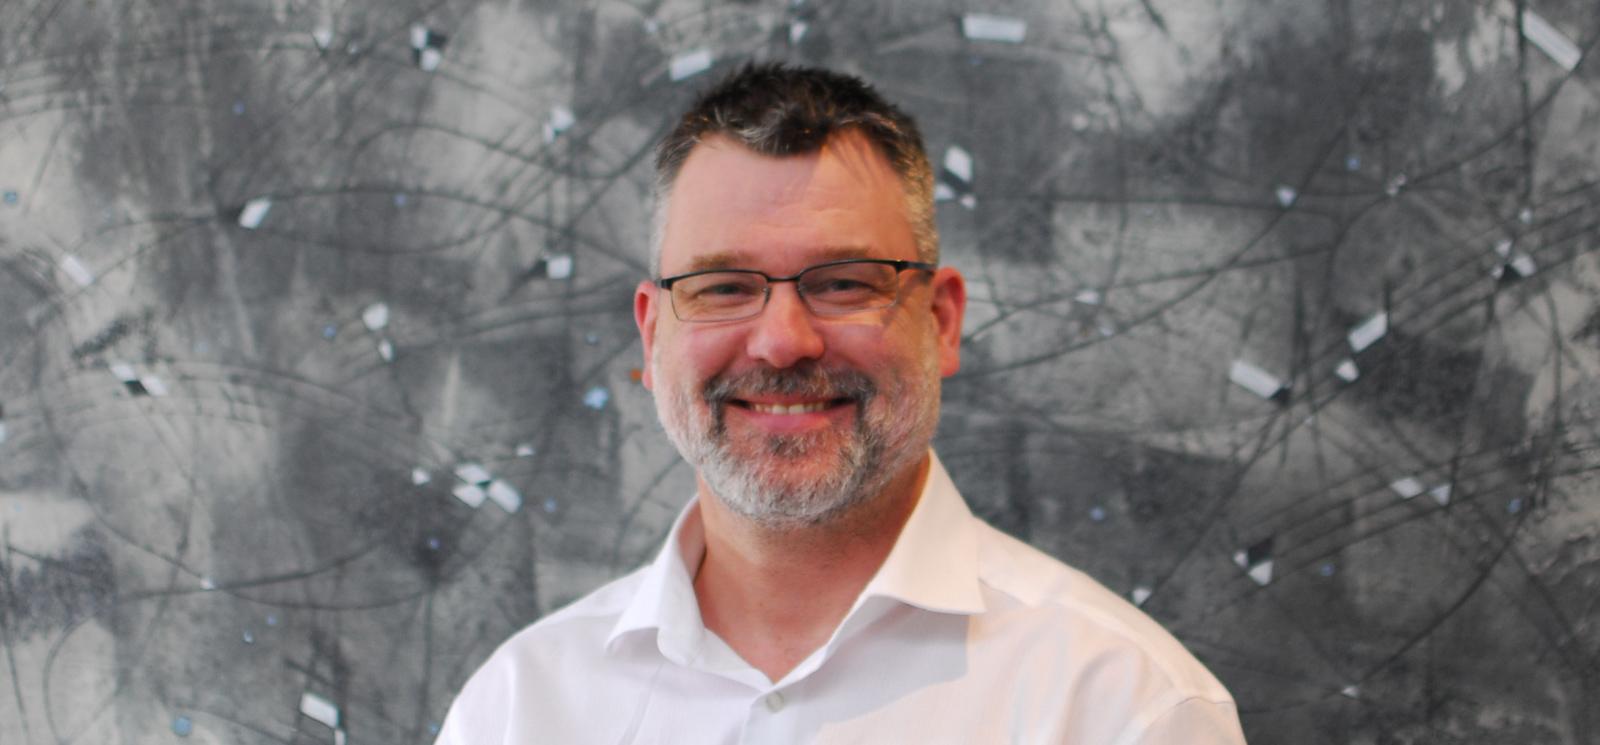 Douglas M. Scheu Architectural Resources Team